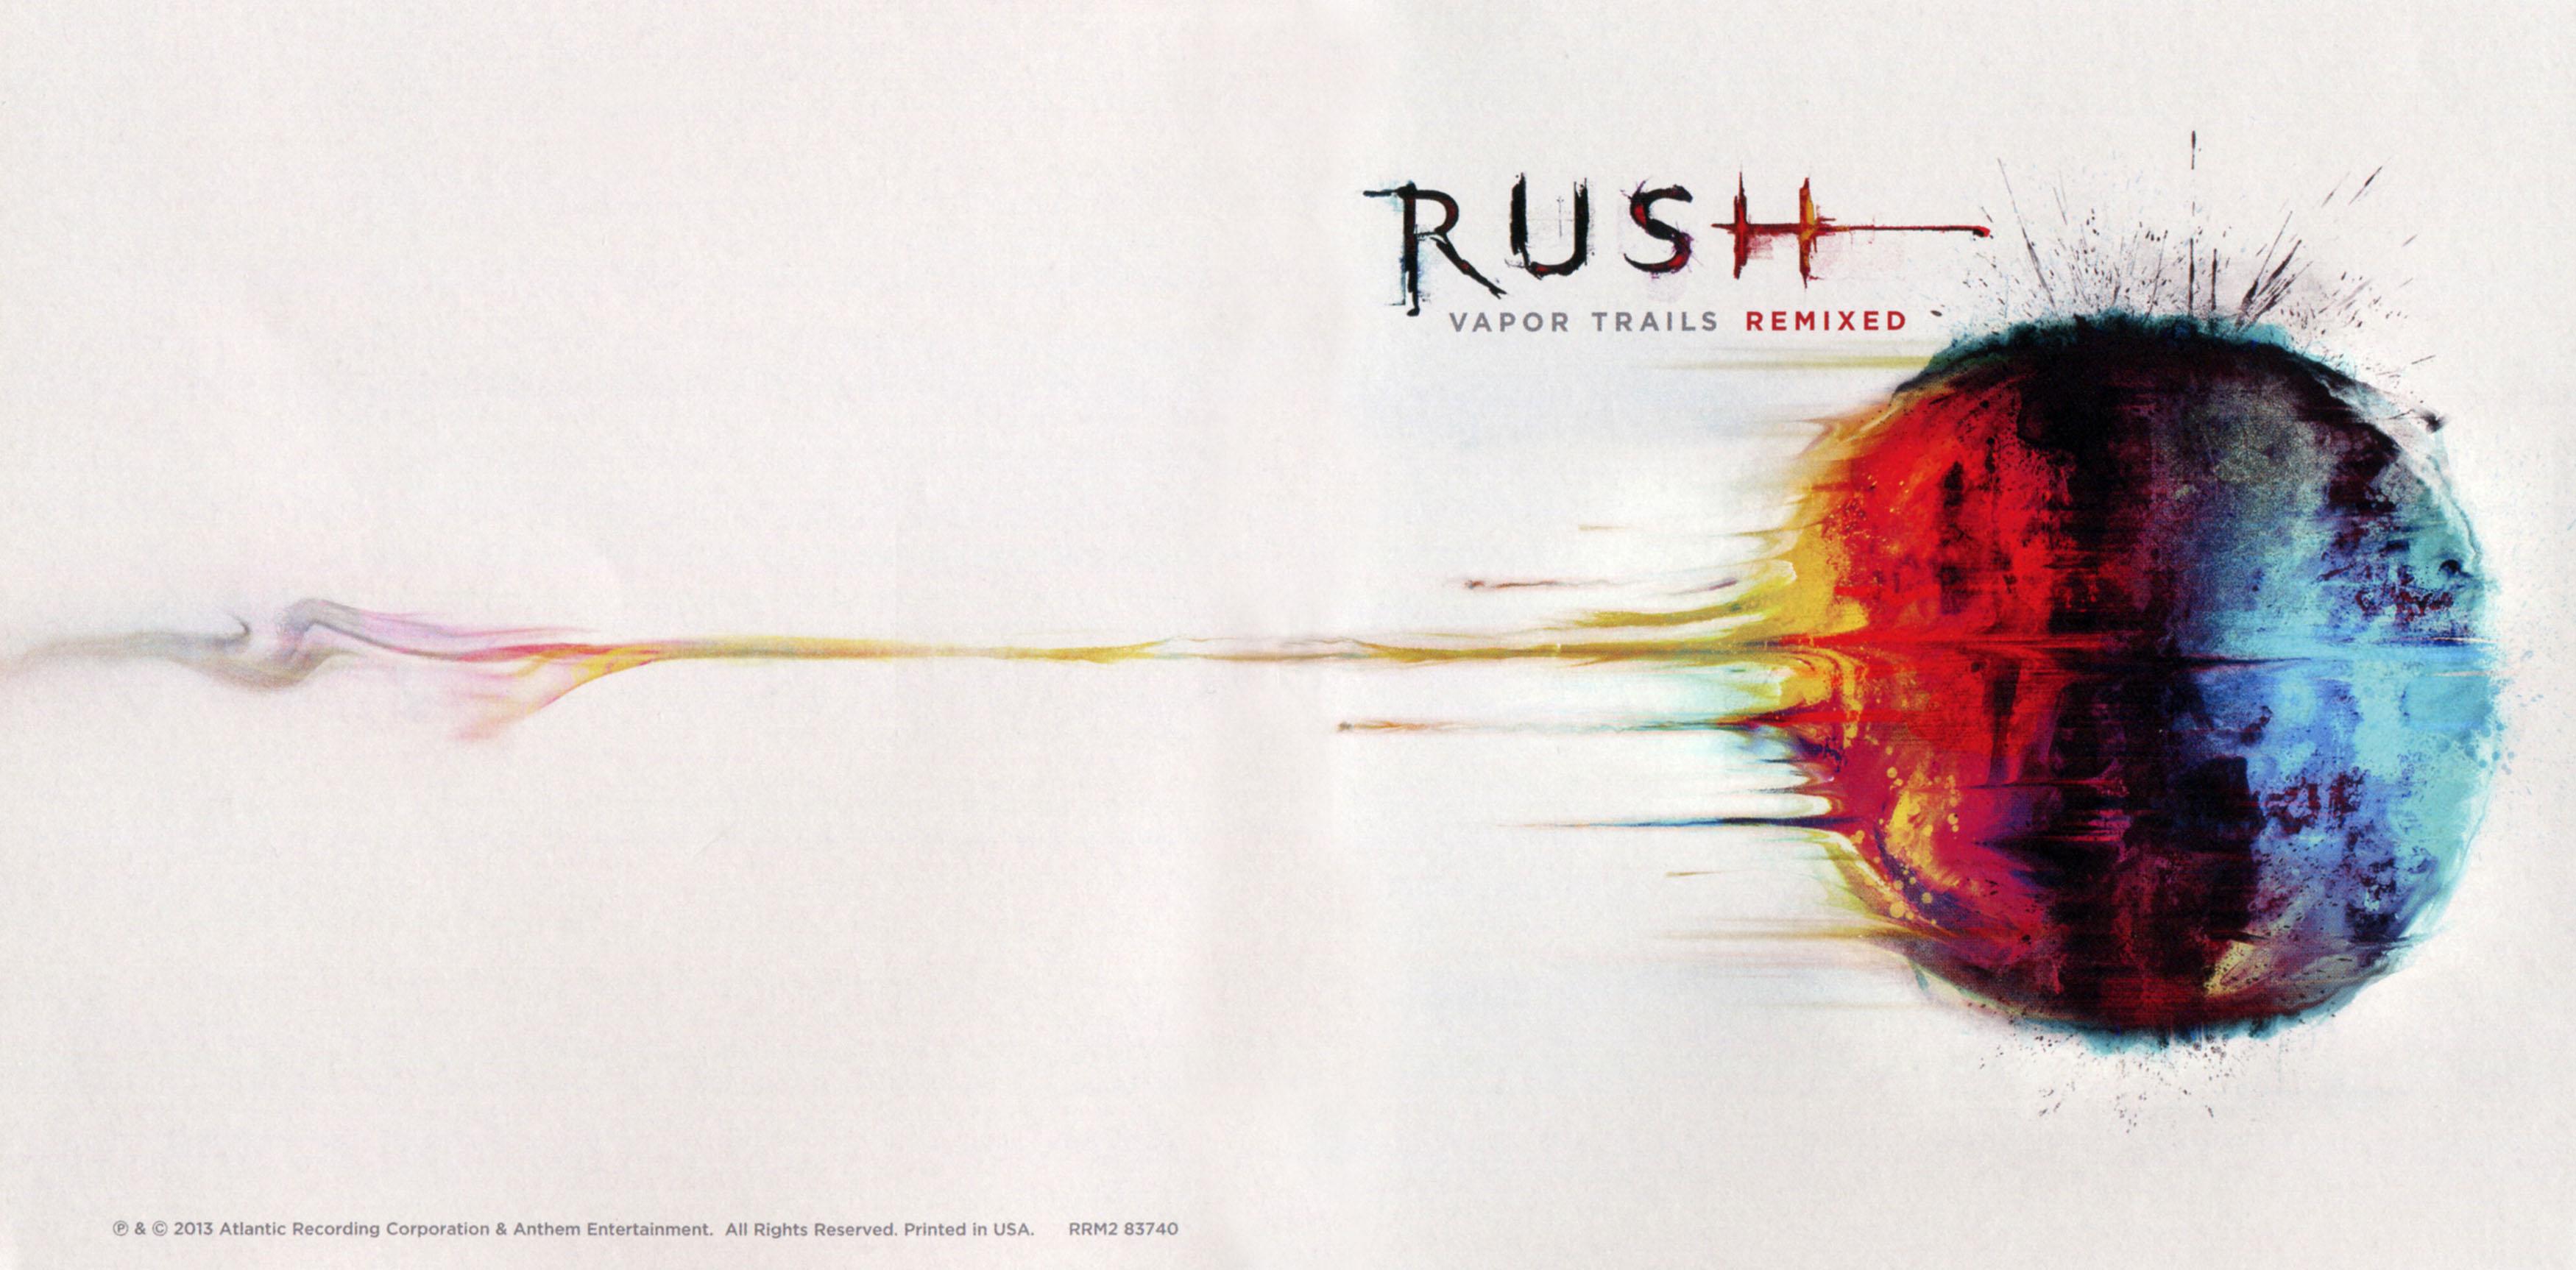 rush vapor trails